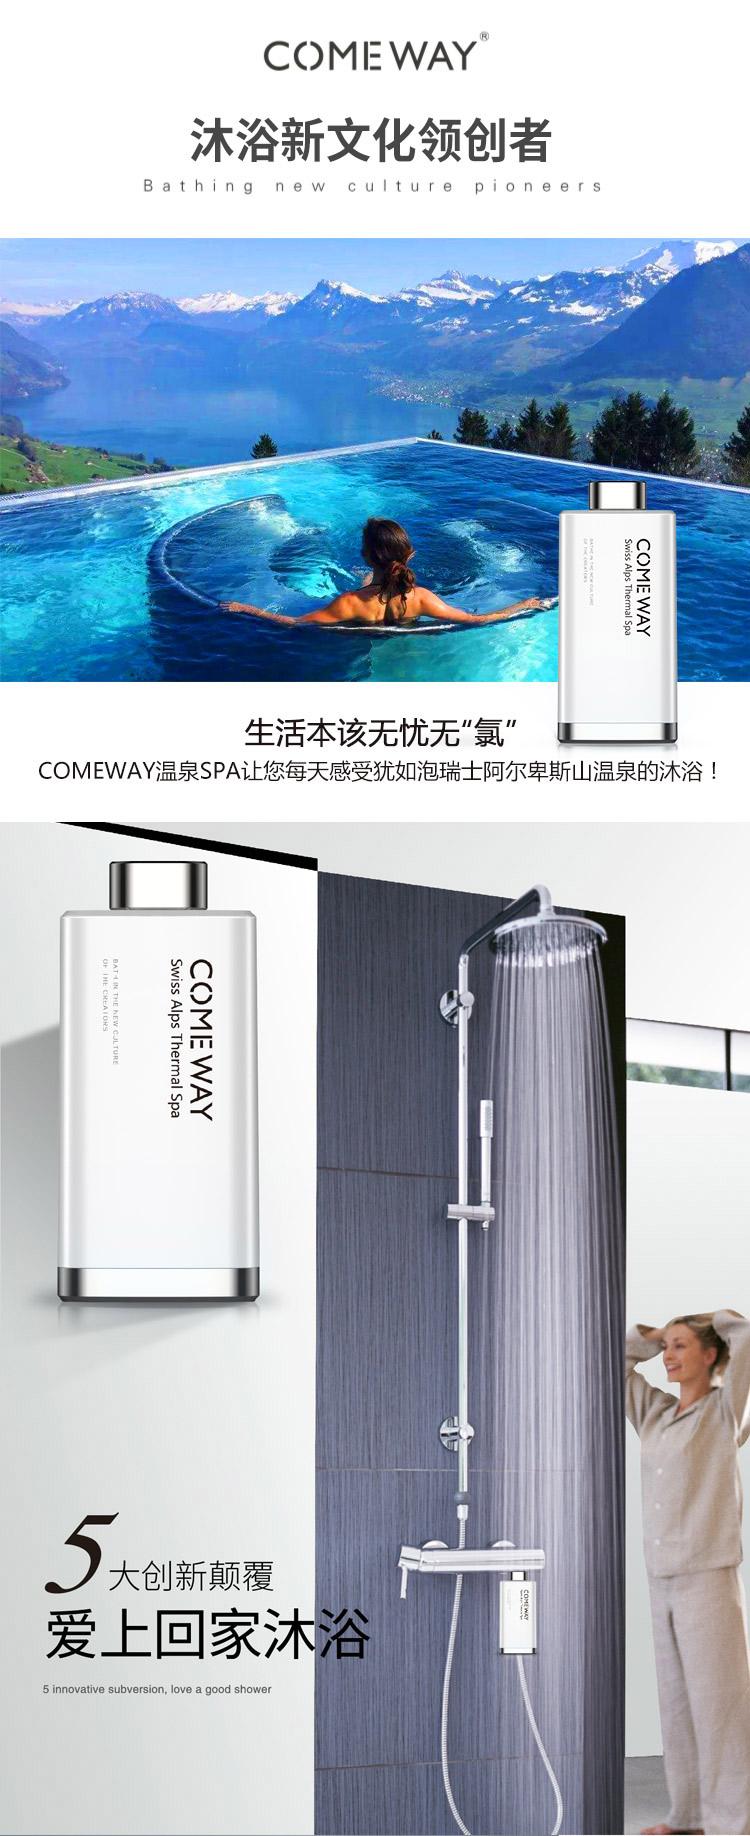 comeway-spa-1-简体_01.jpg